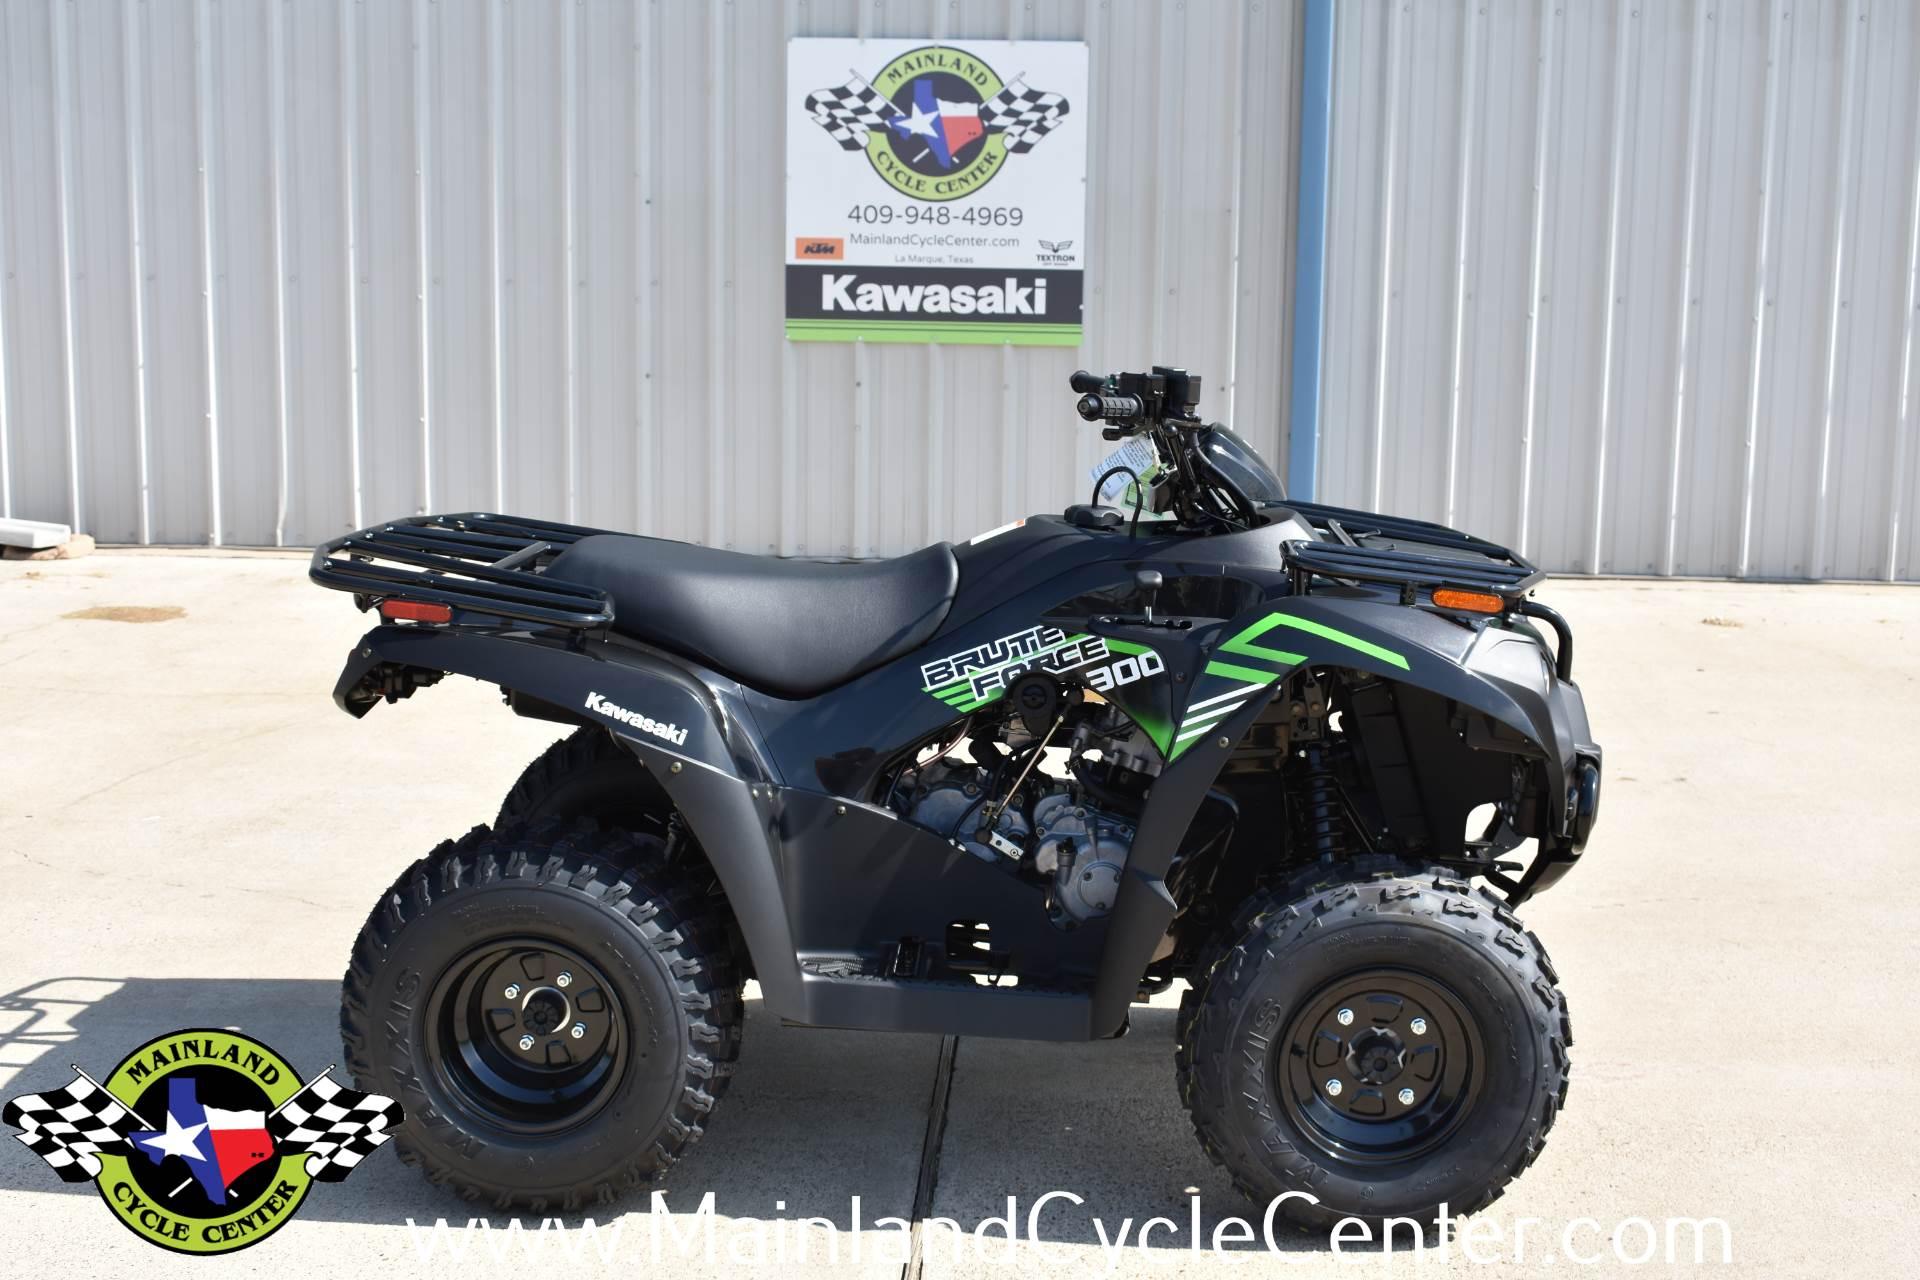 New 2020 Kawasaki Brute Force 300 Super Black Atvs In La